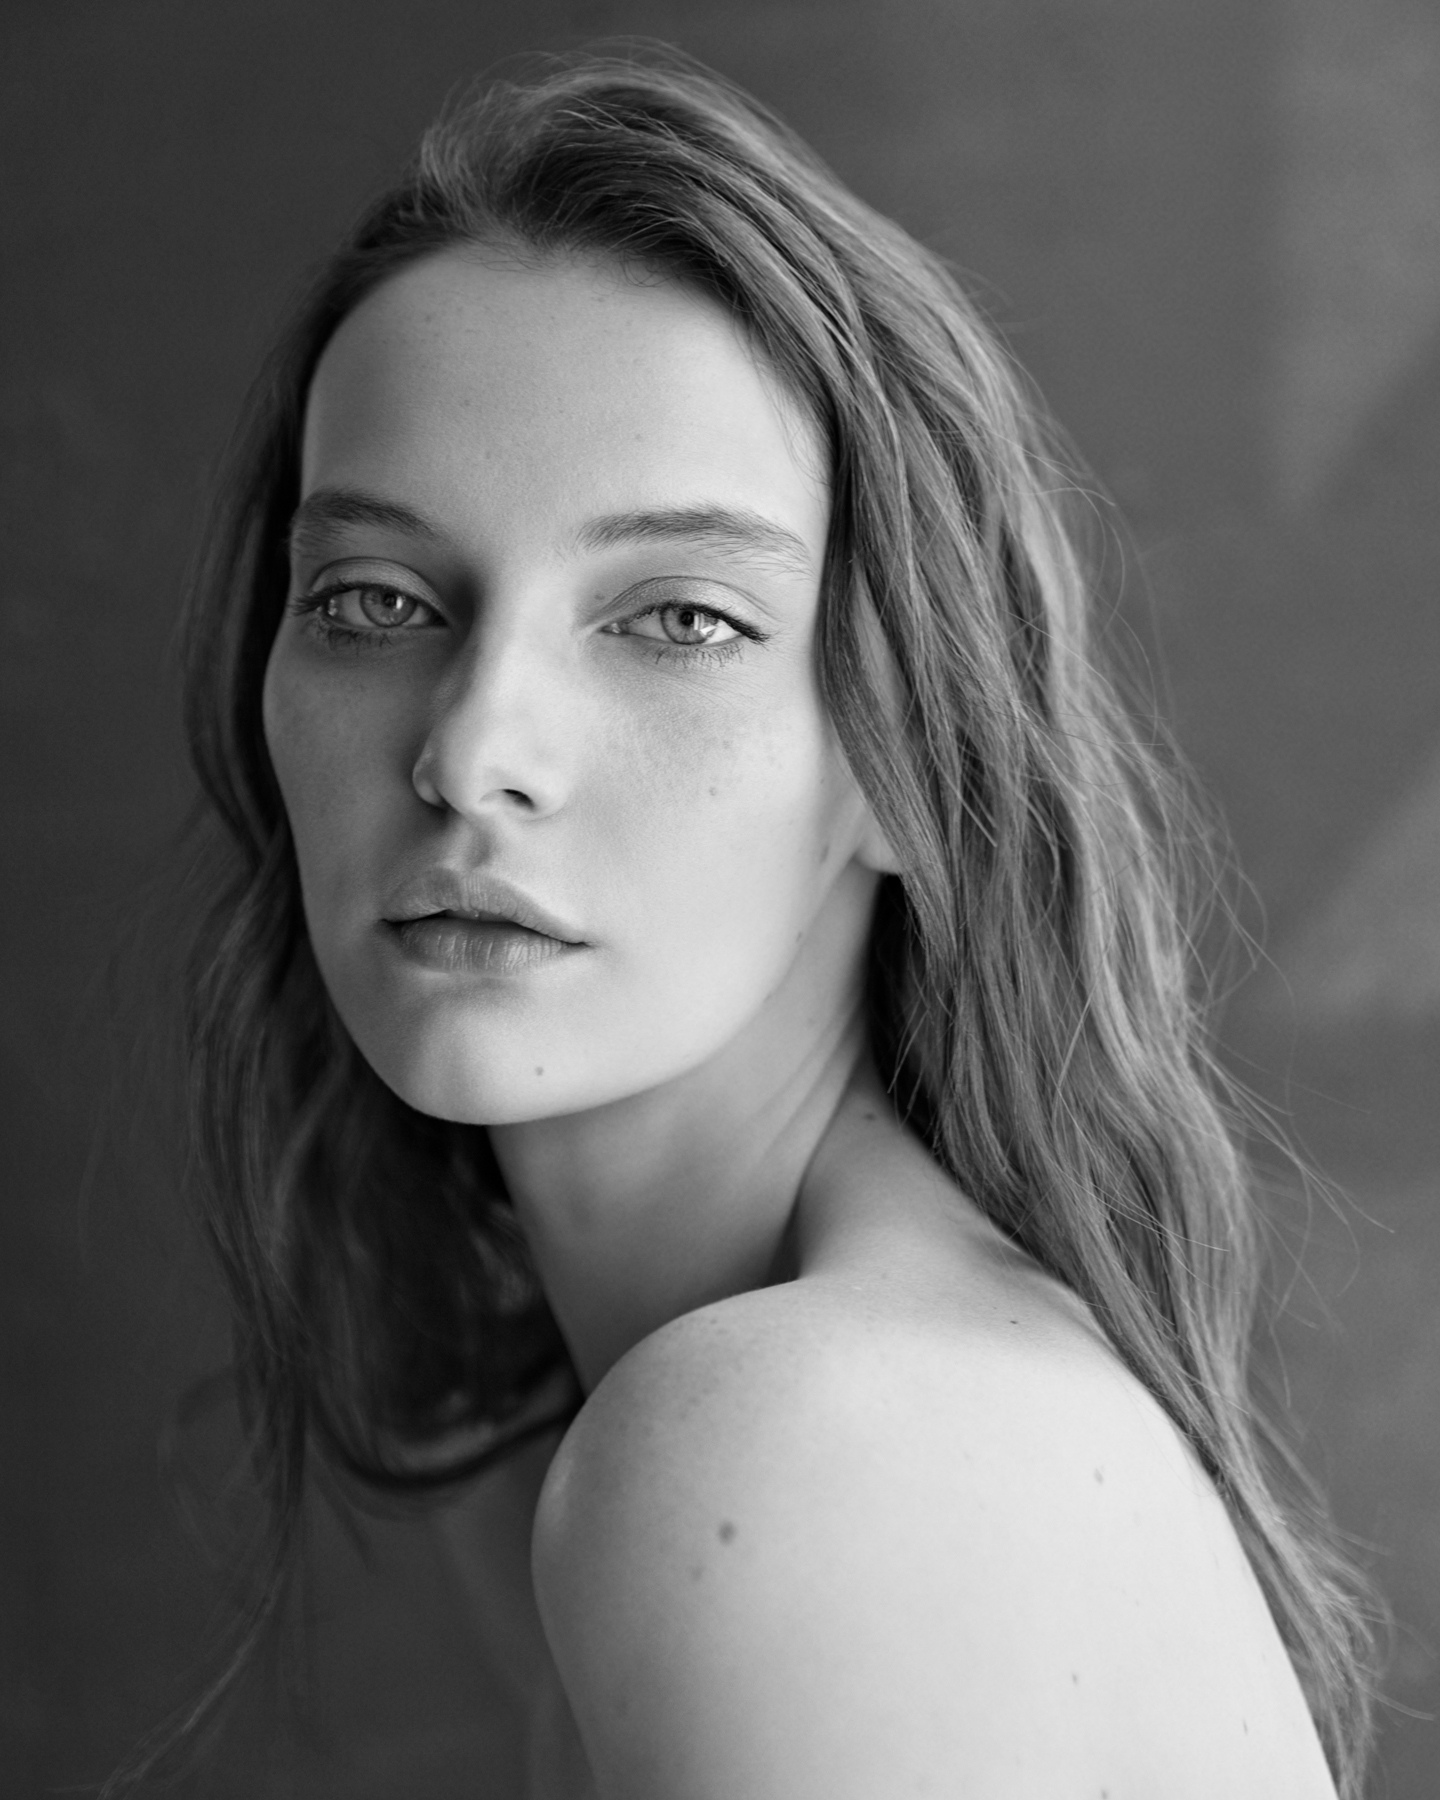 Tamara Derkach nudes (38 pics), photo Erotica, iCloud, bra 2015